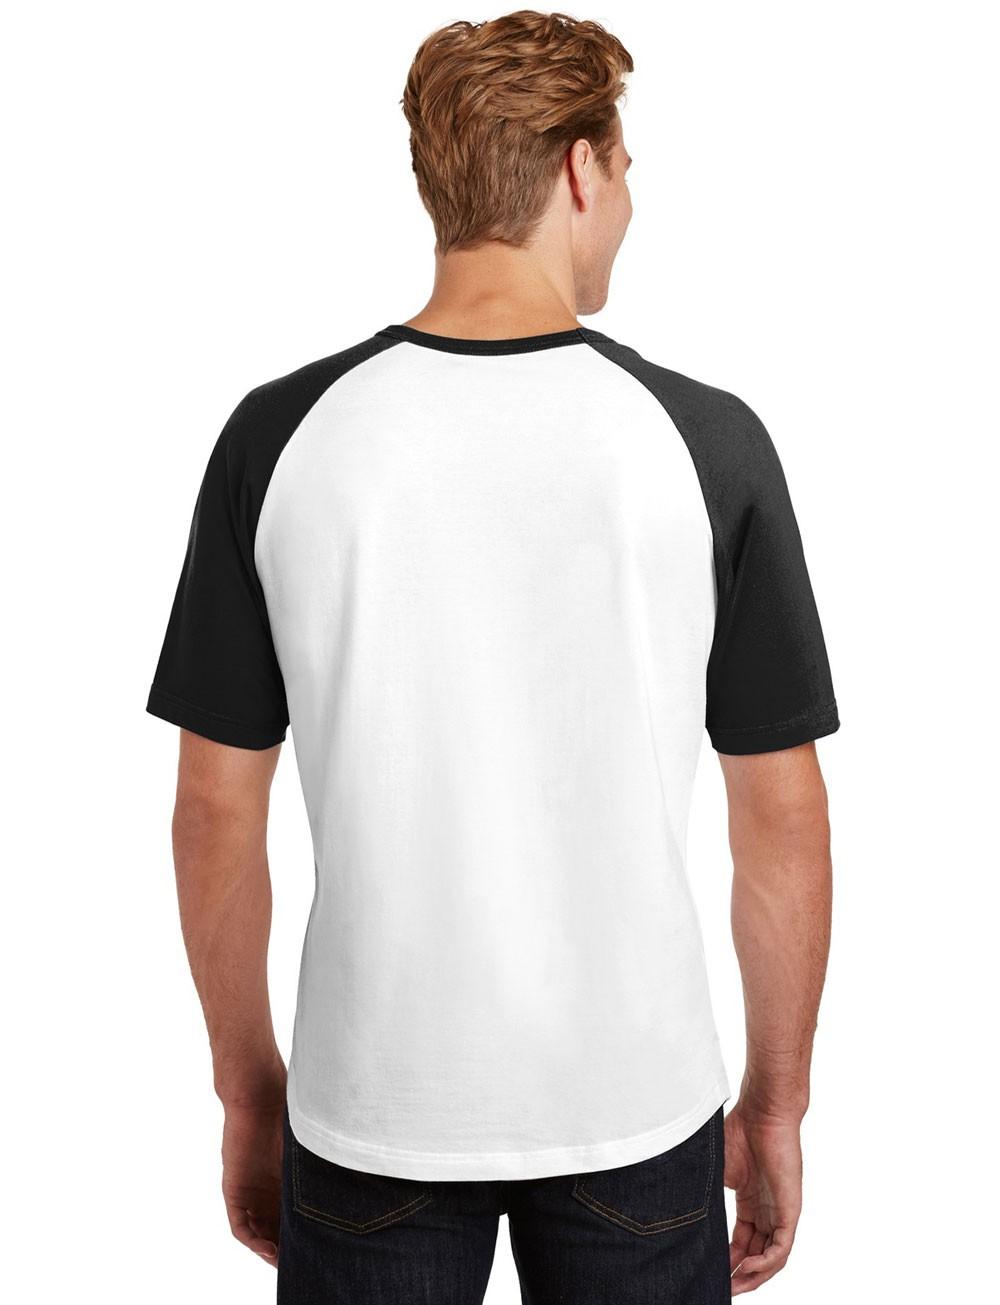 Camiseta Masculina Raglan Long Live The Beard ES_207